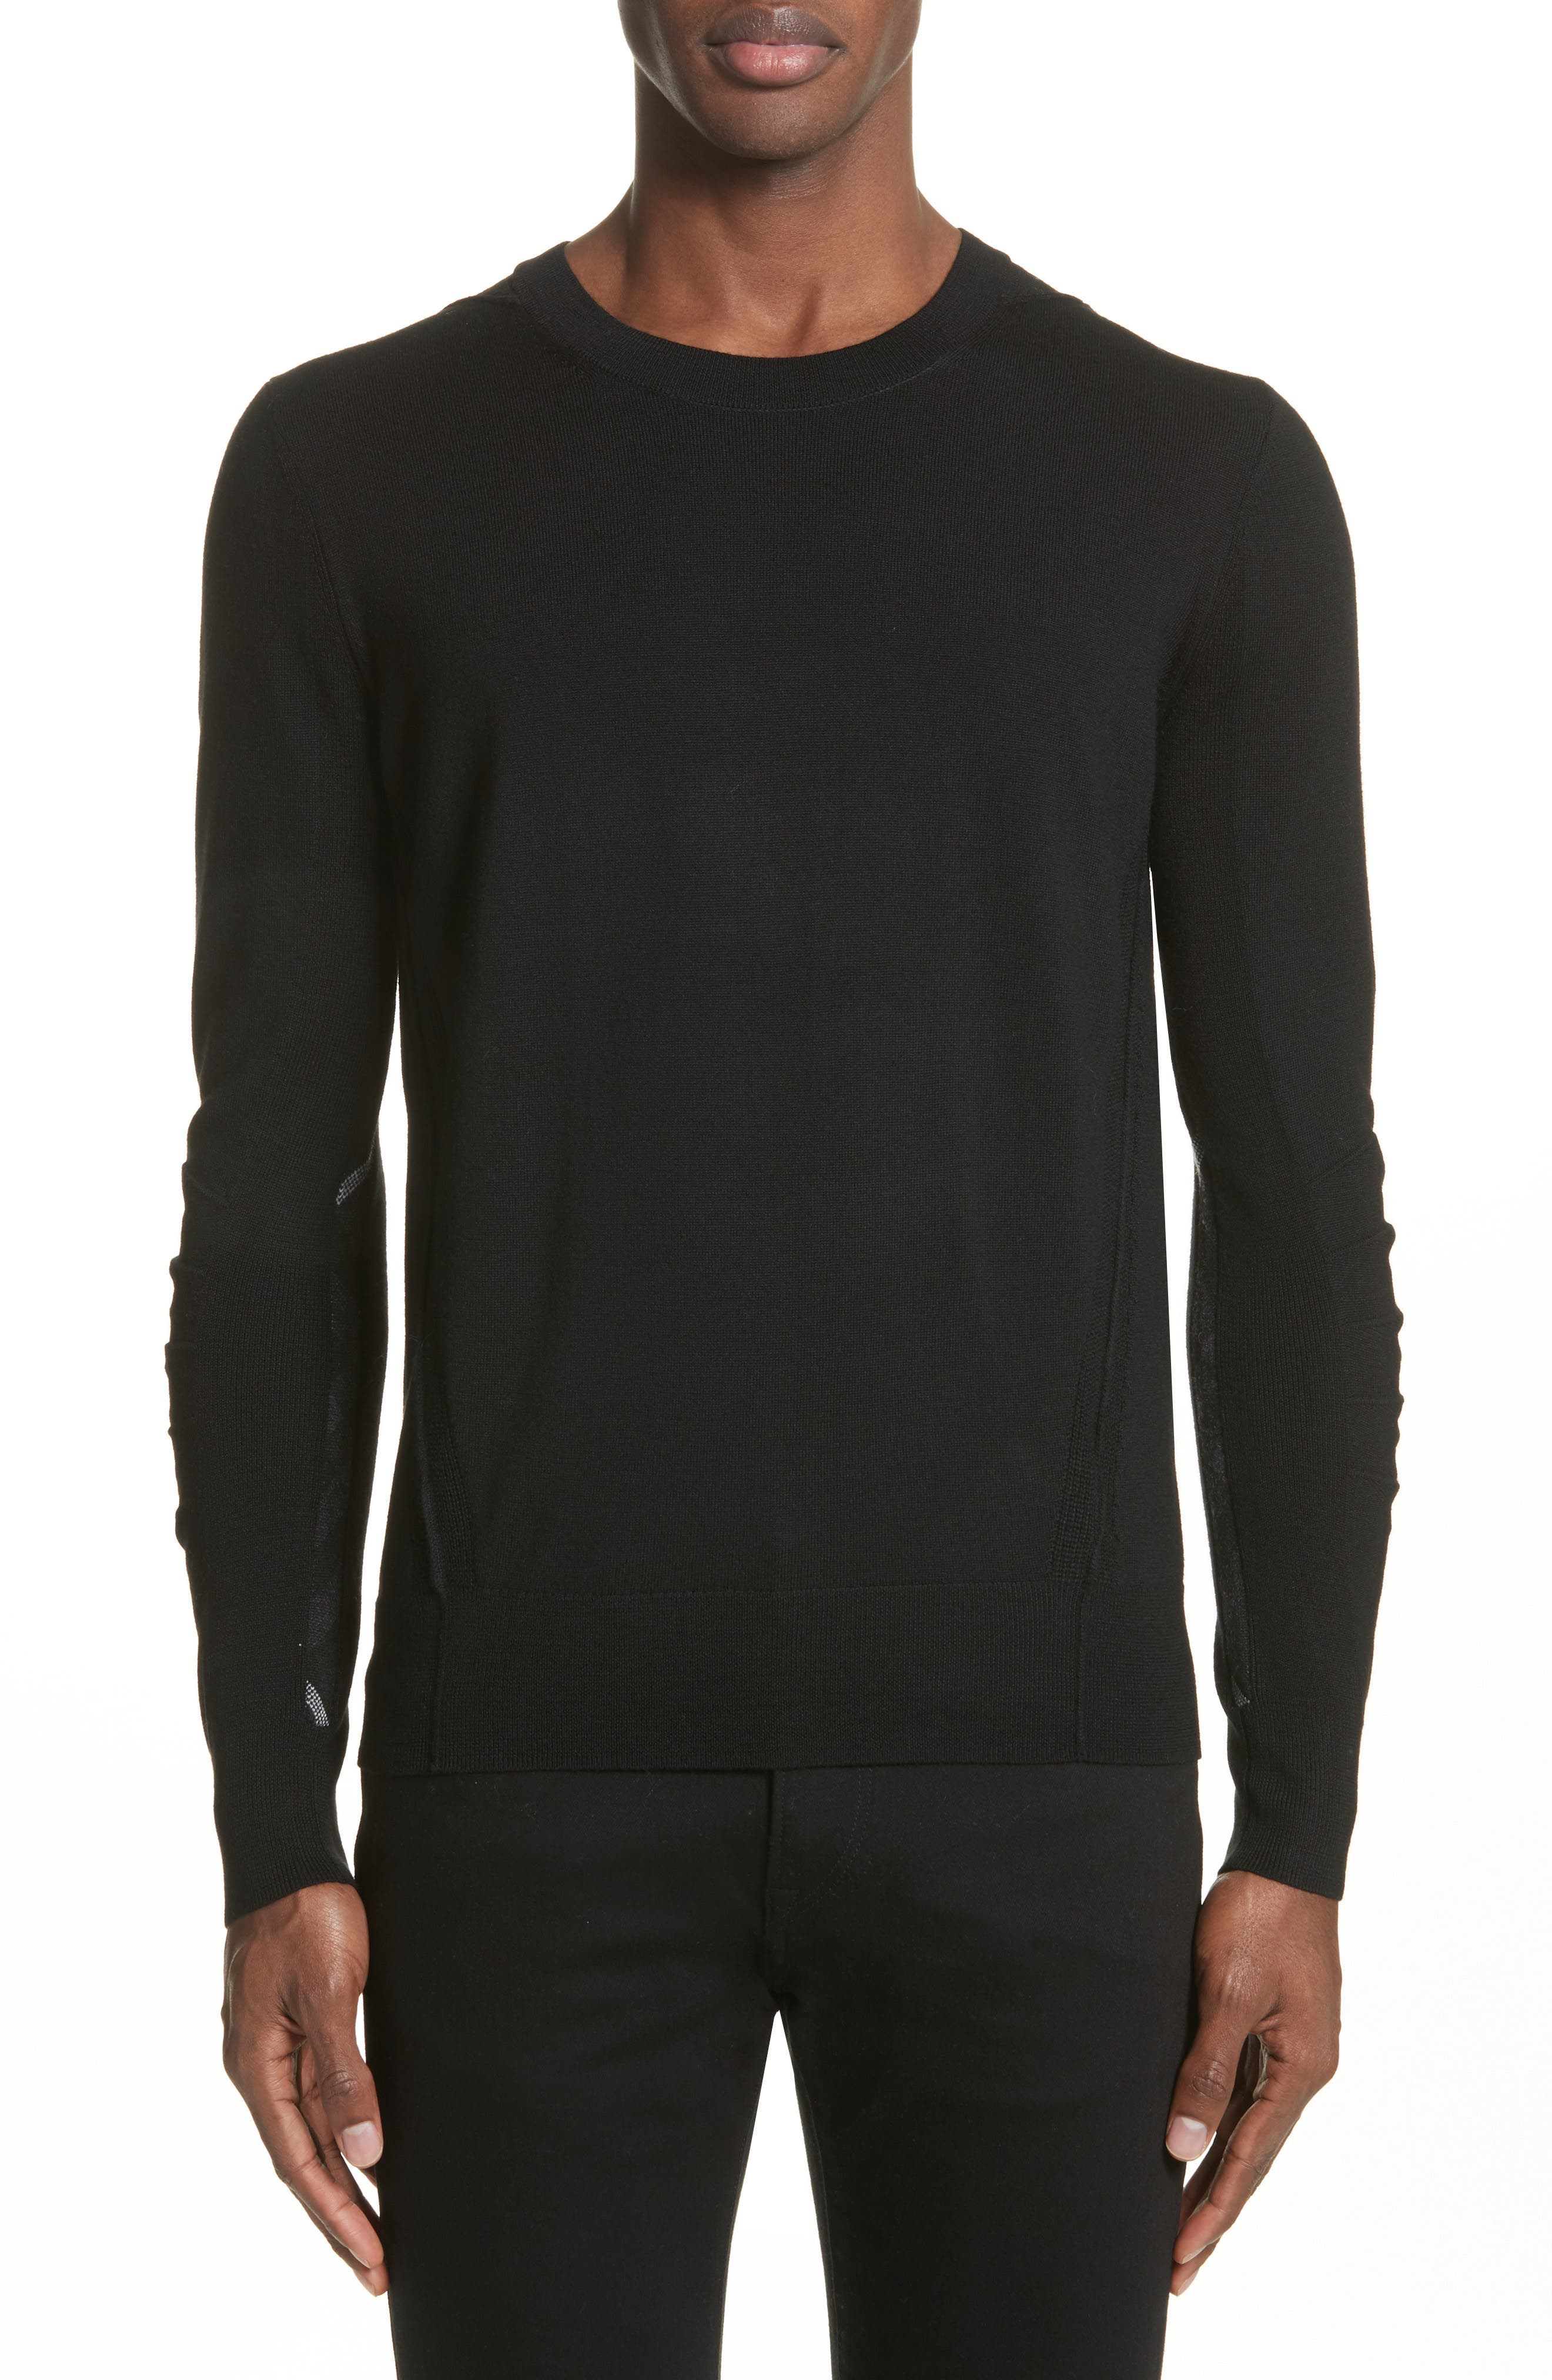 Main Image - Burberry Carter Merino Wool Crewneck Sweater